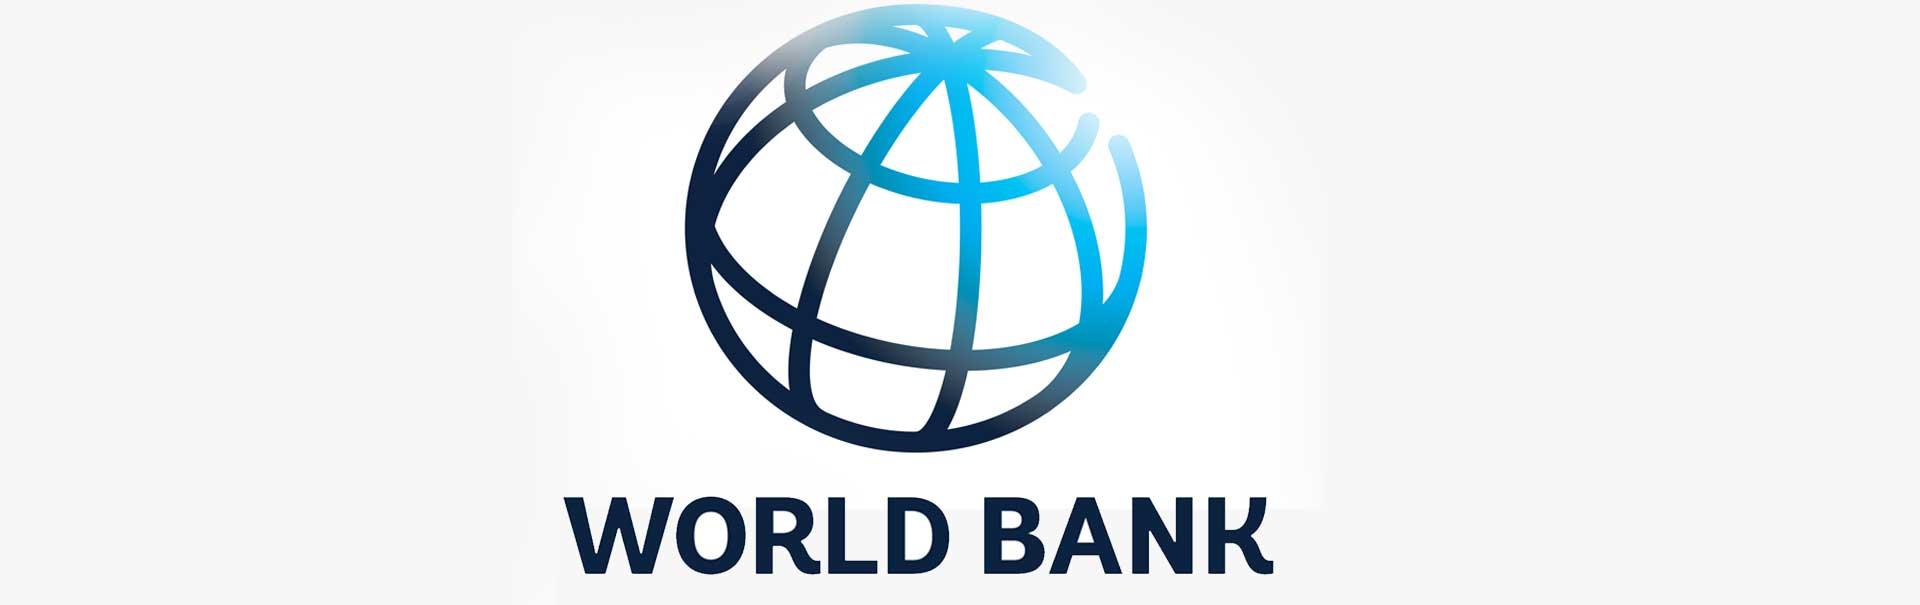 विश्व बैंकद्वारा १ अर्ब २७ करोड अनुदान